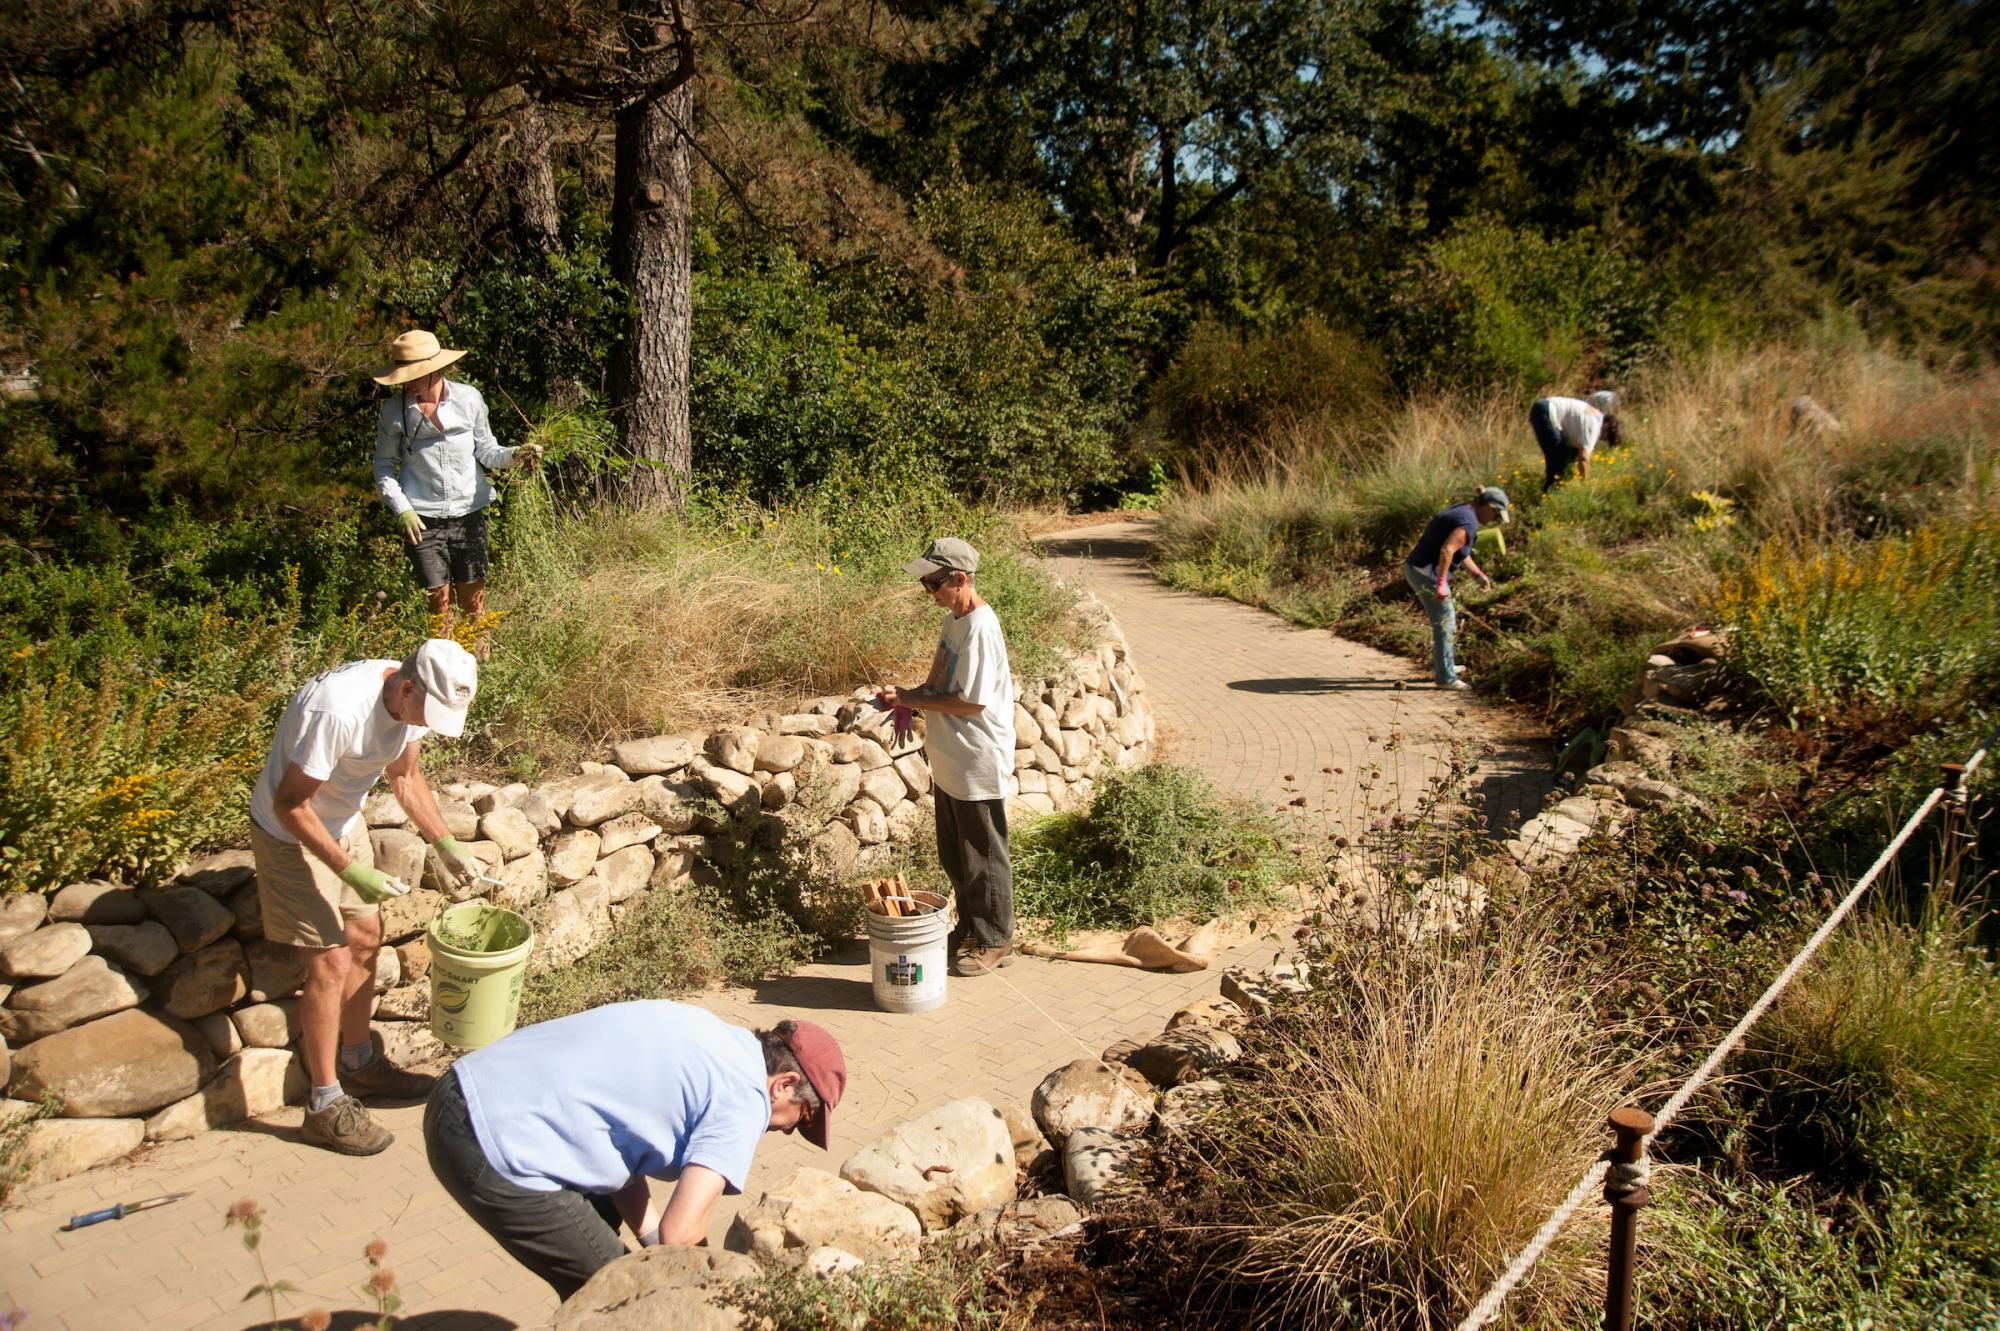 People pull weeds in the Arboretum